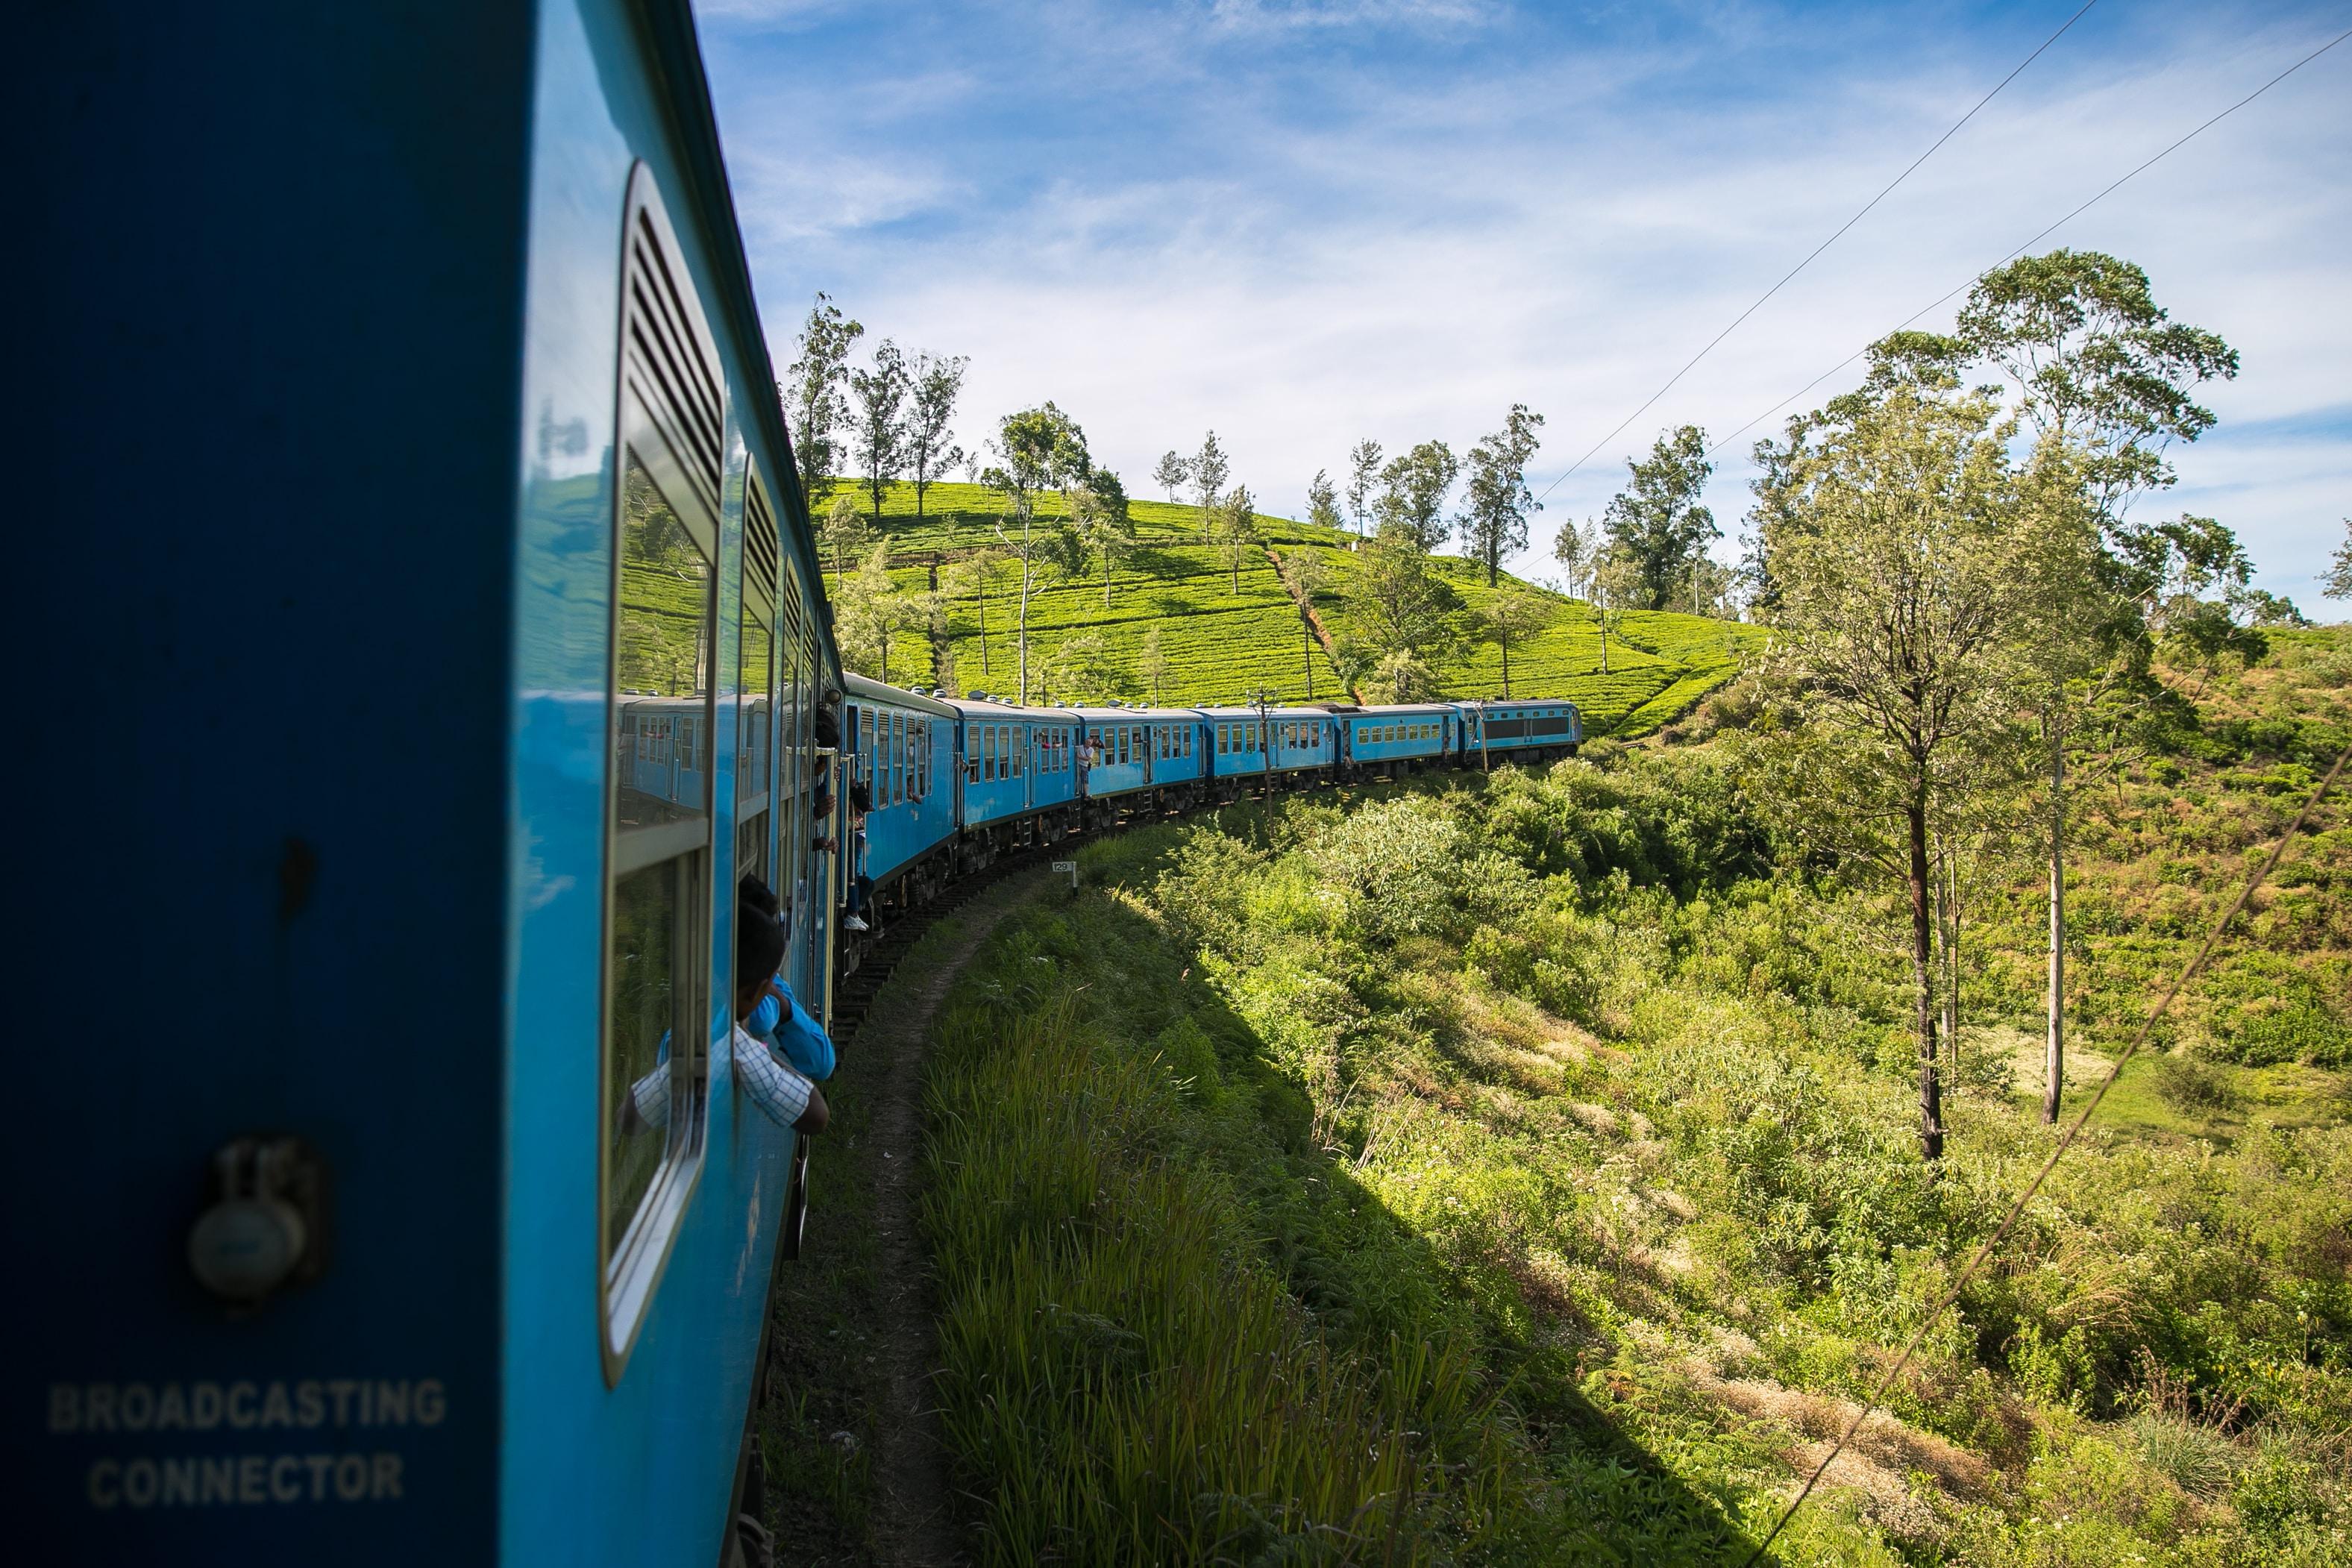 Impact Trips - mit Zug statt Flug!